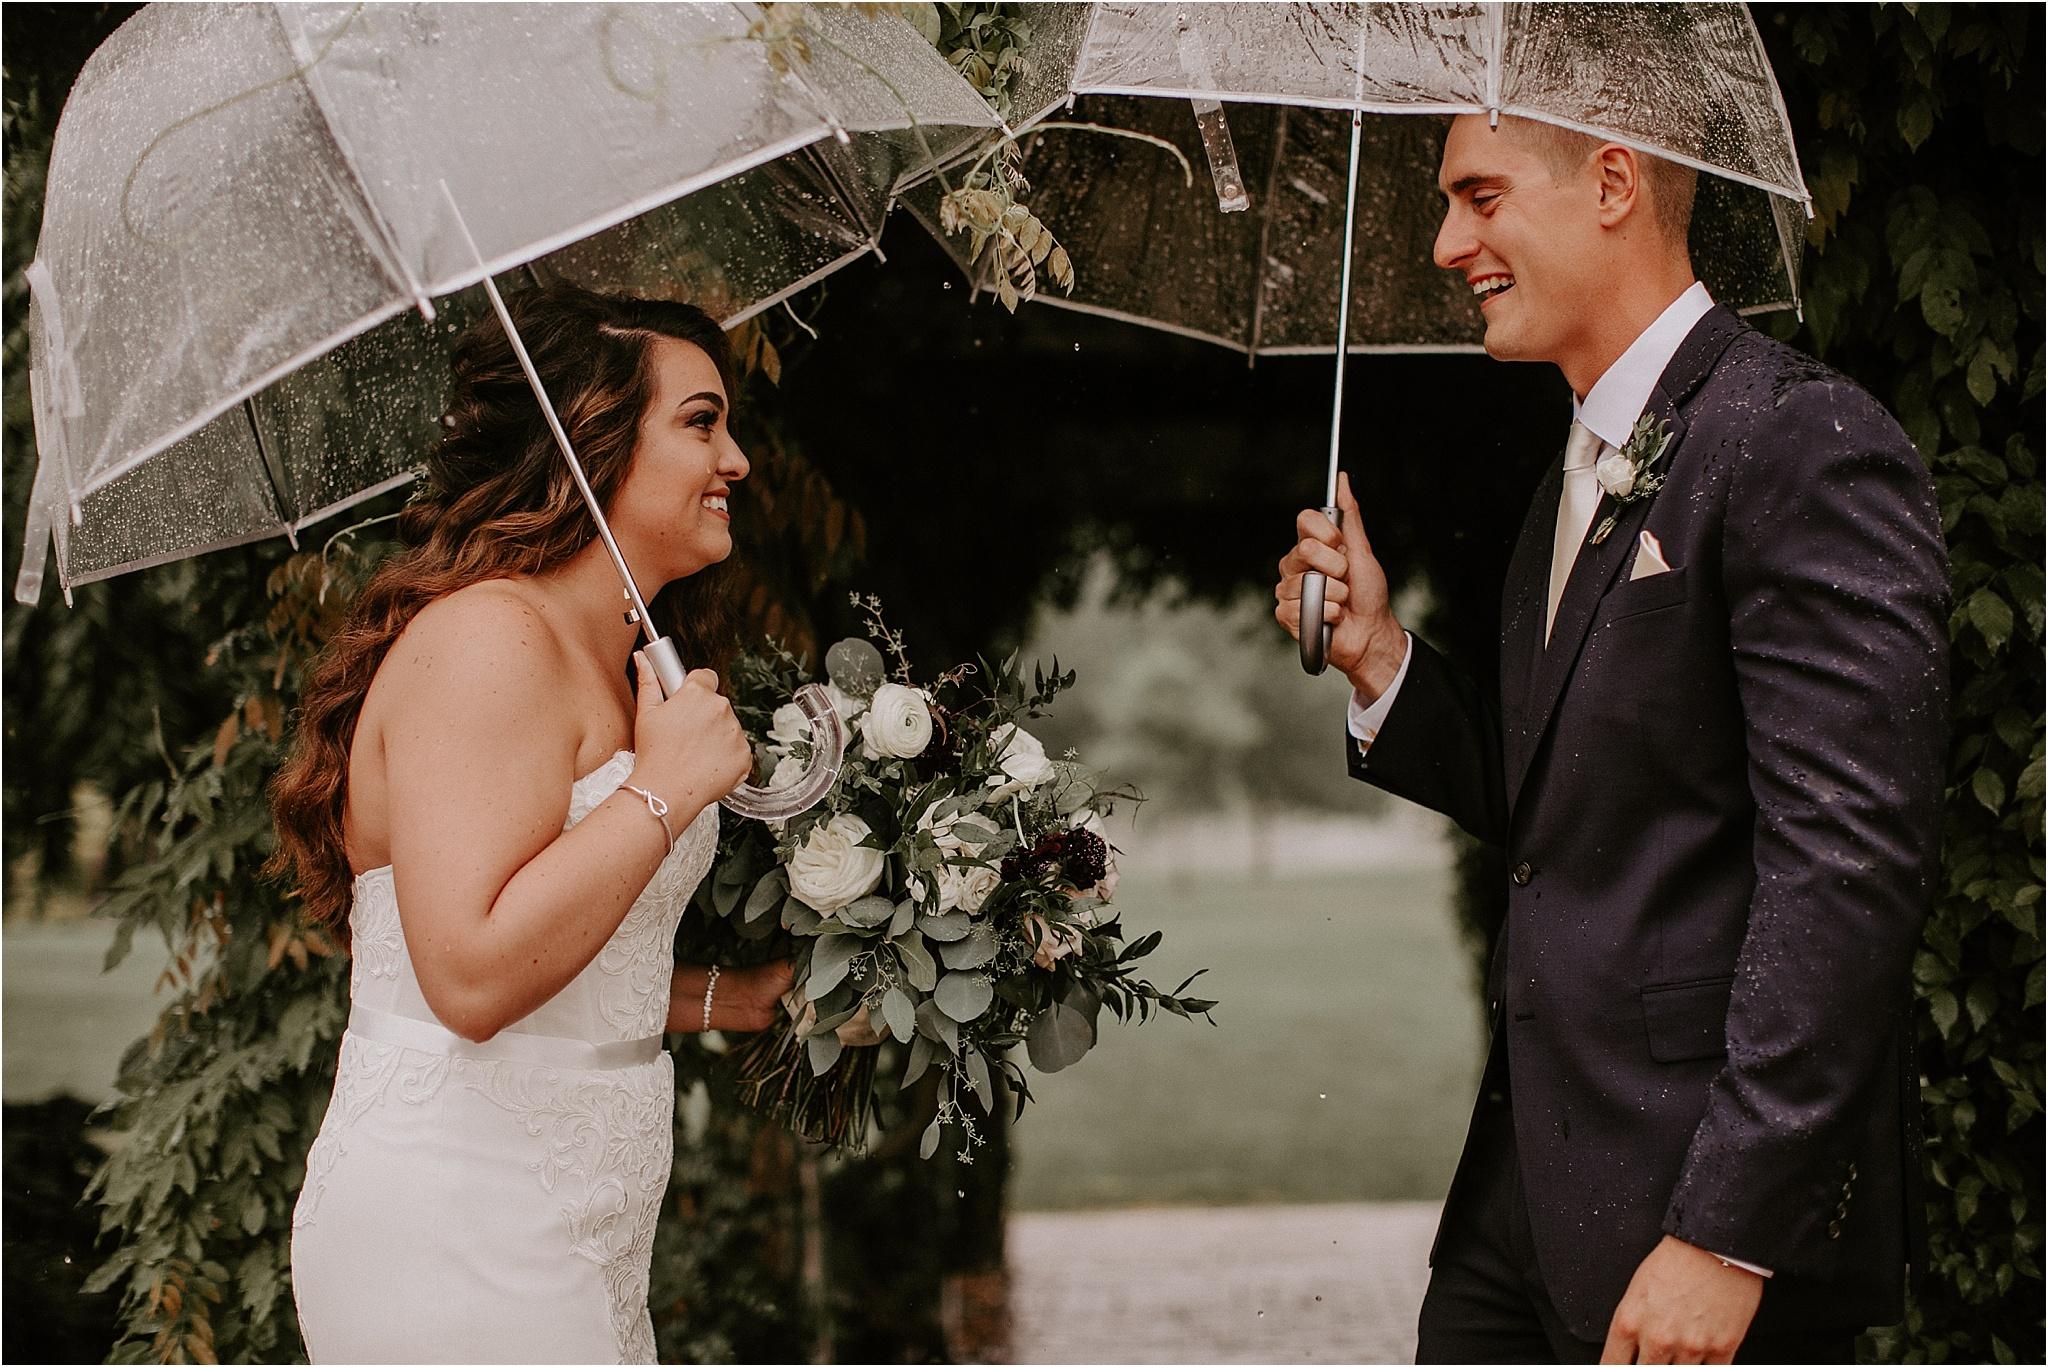 Sarah_Brookhart_Philadelphia_Wedding_Photographer_0011-1.jpg